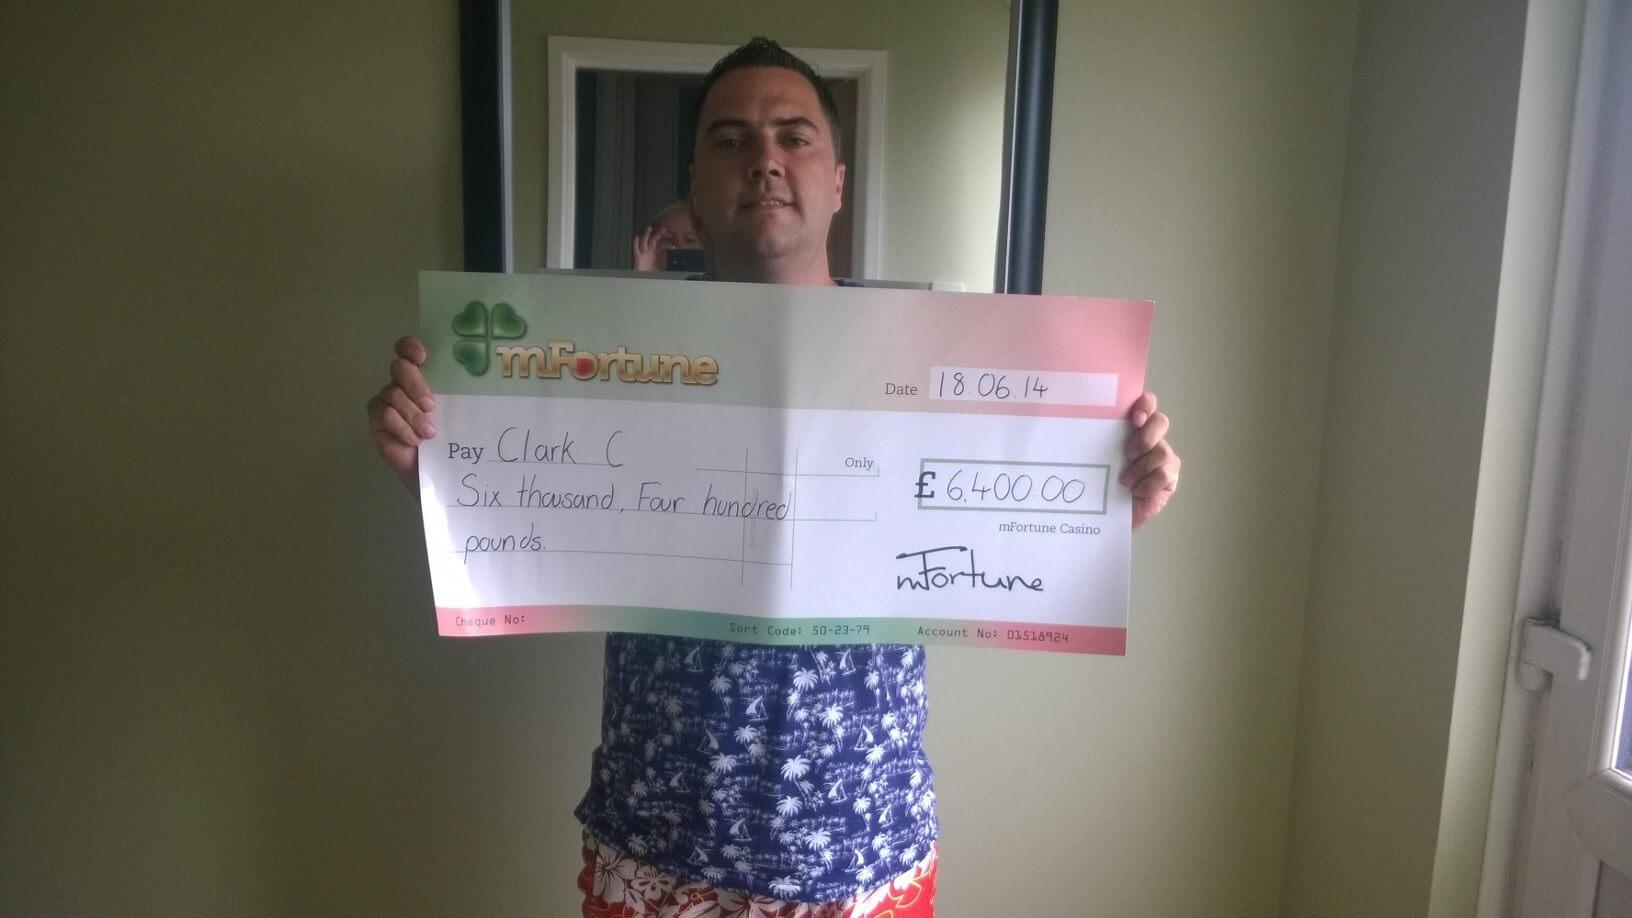 Clark C won £ 6,400